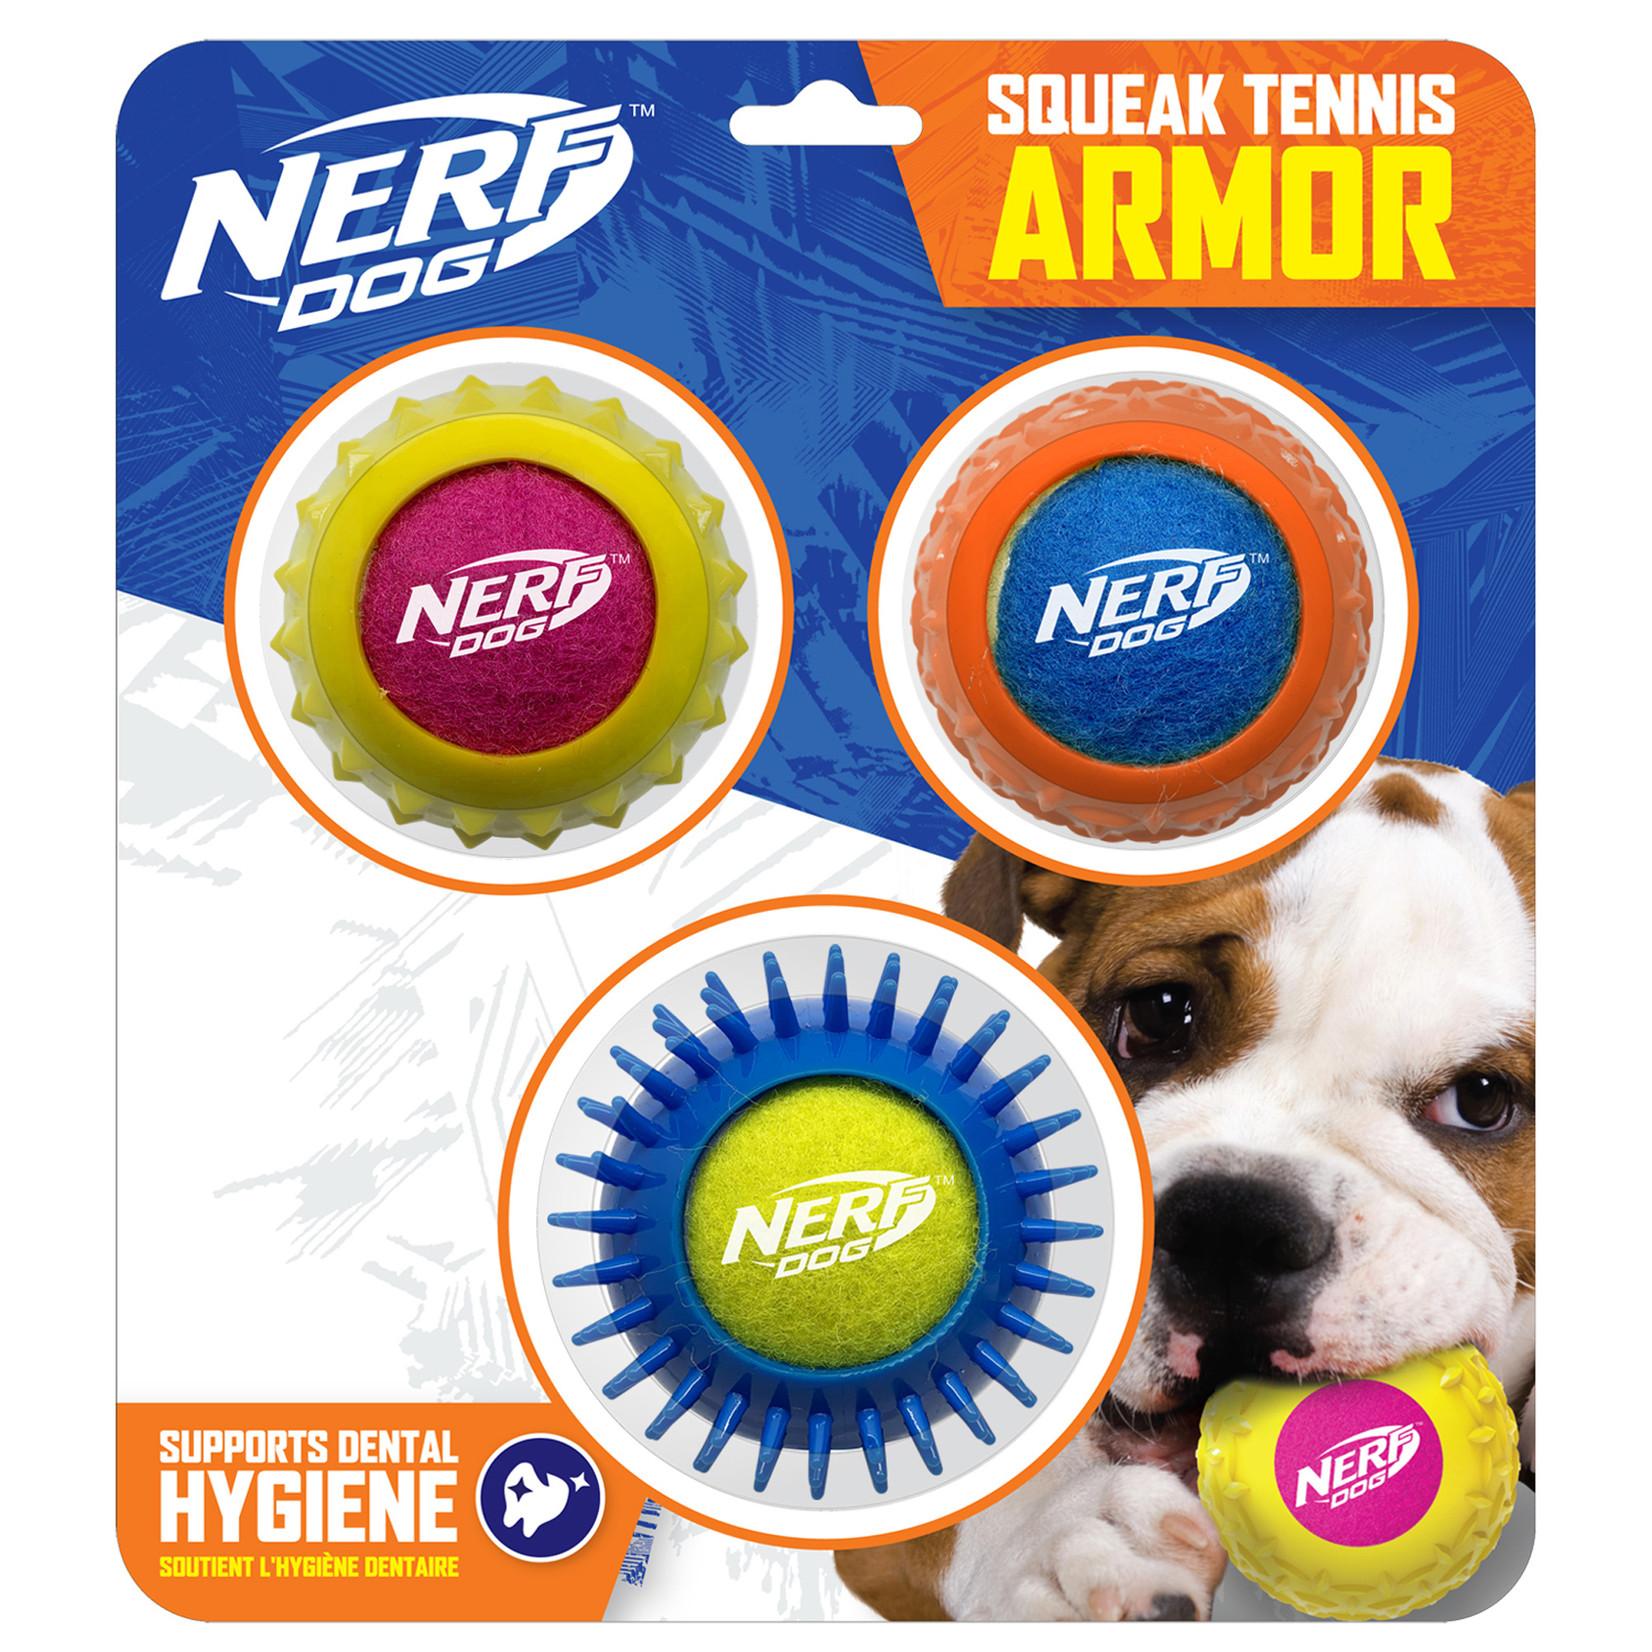 Nerf Dog Tennis Armor 3pk-NF-7259